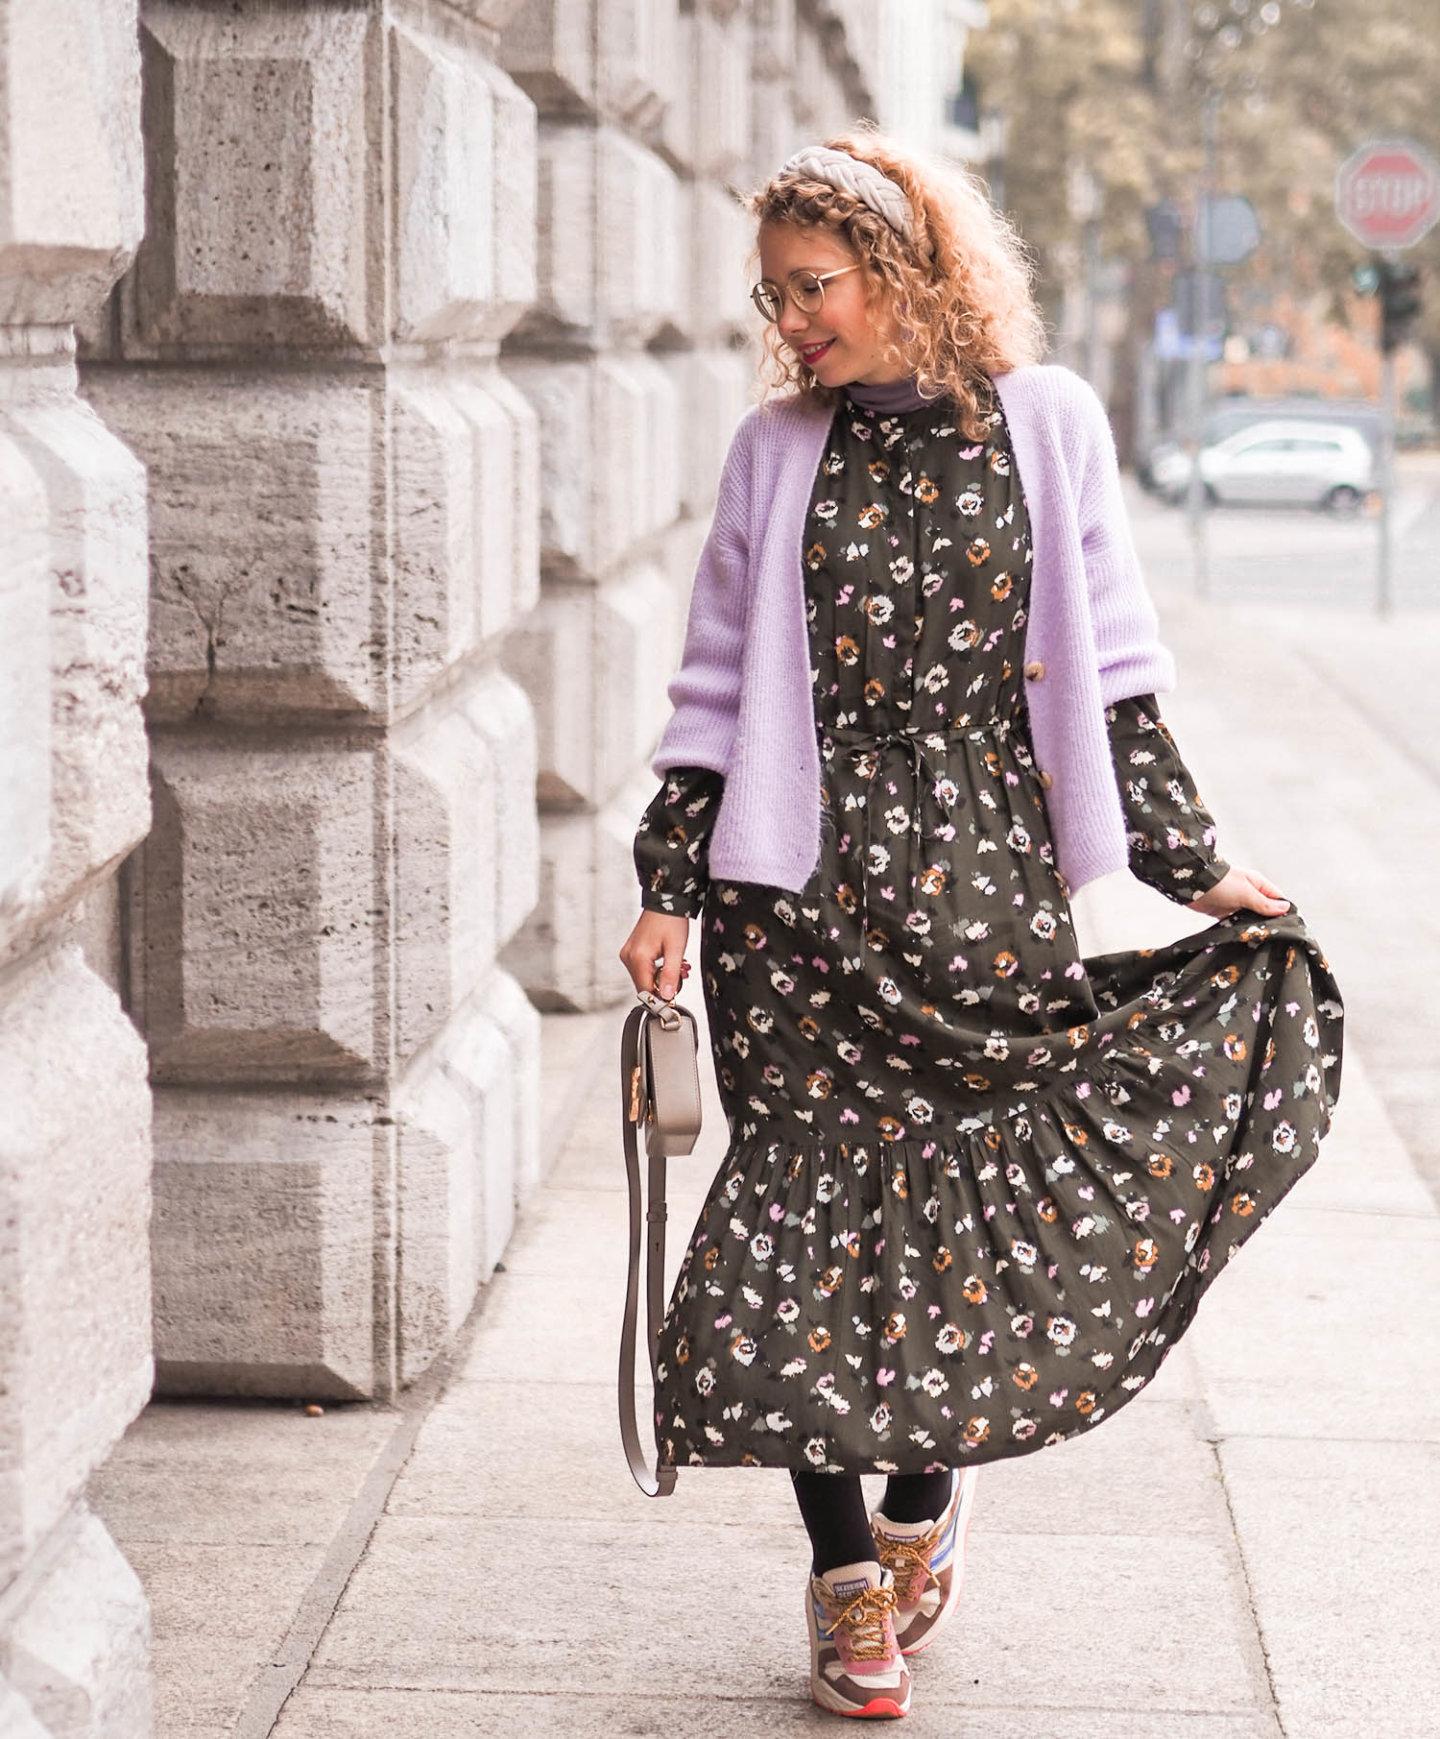 Herbstkleid mit cardigan und sneakers